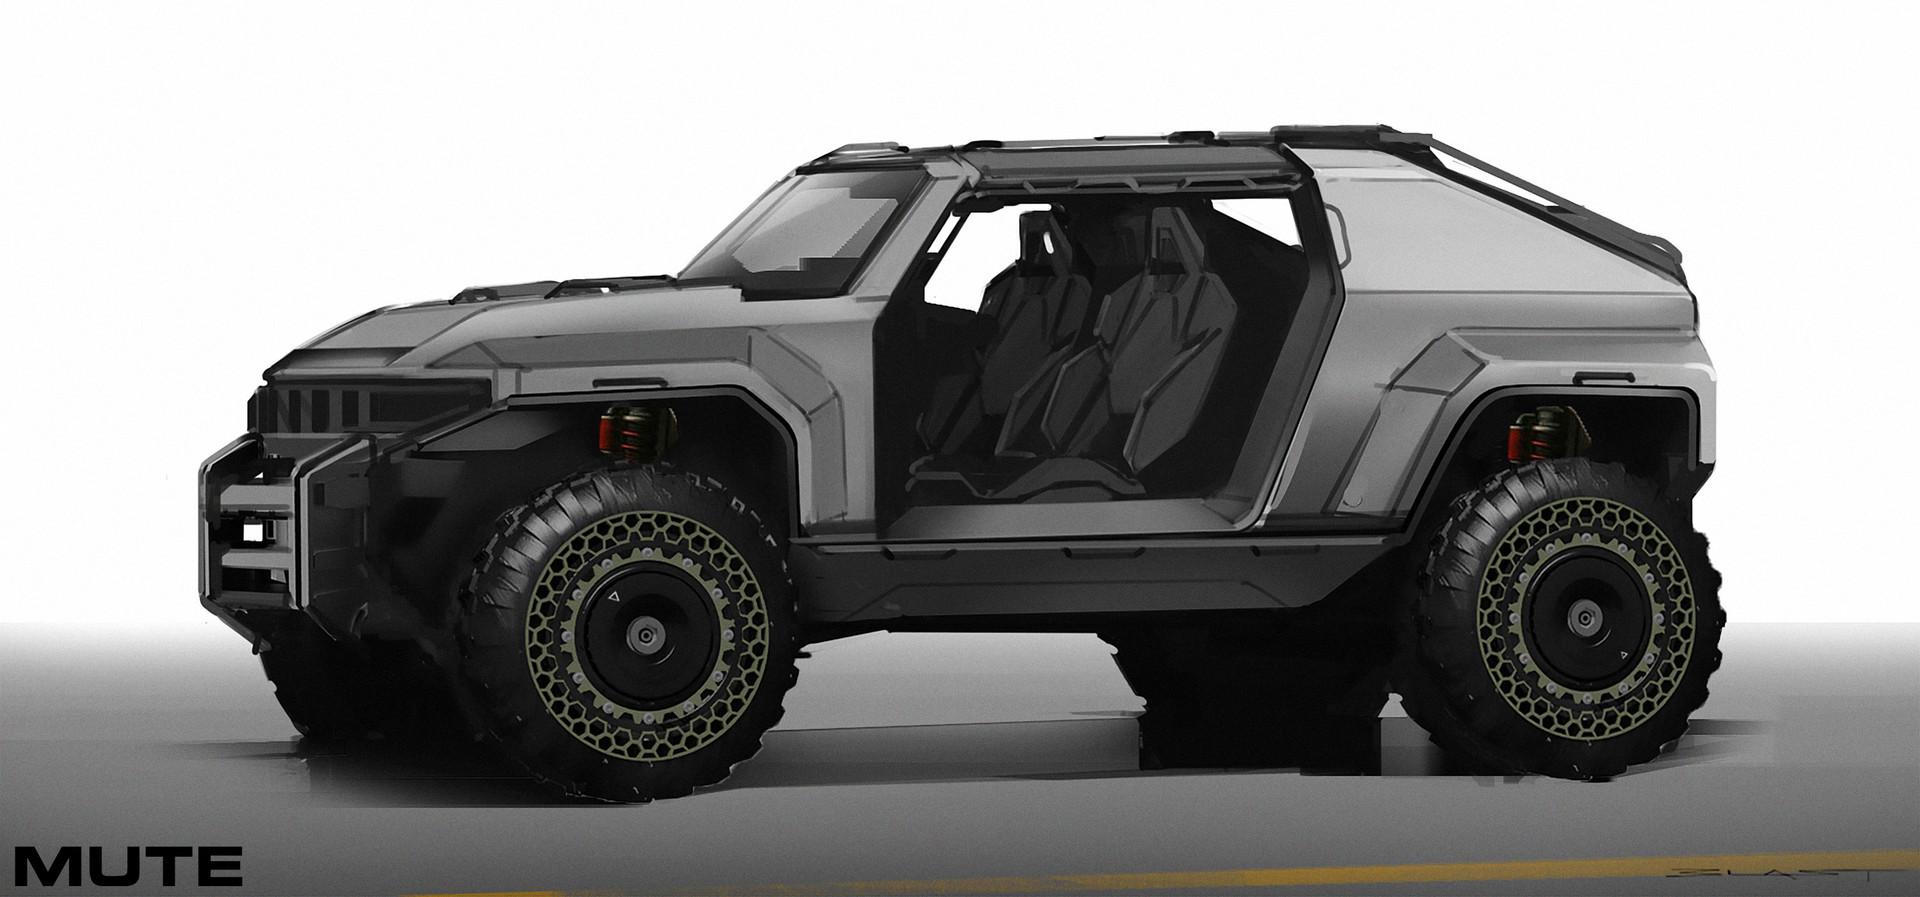 Benjamin last mute jeep sketch3 blast